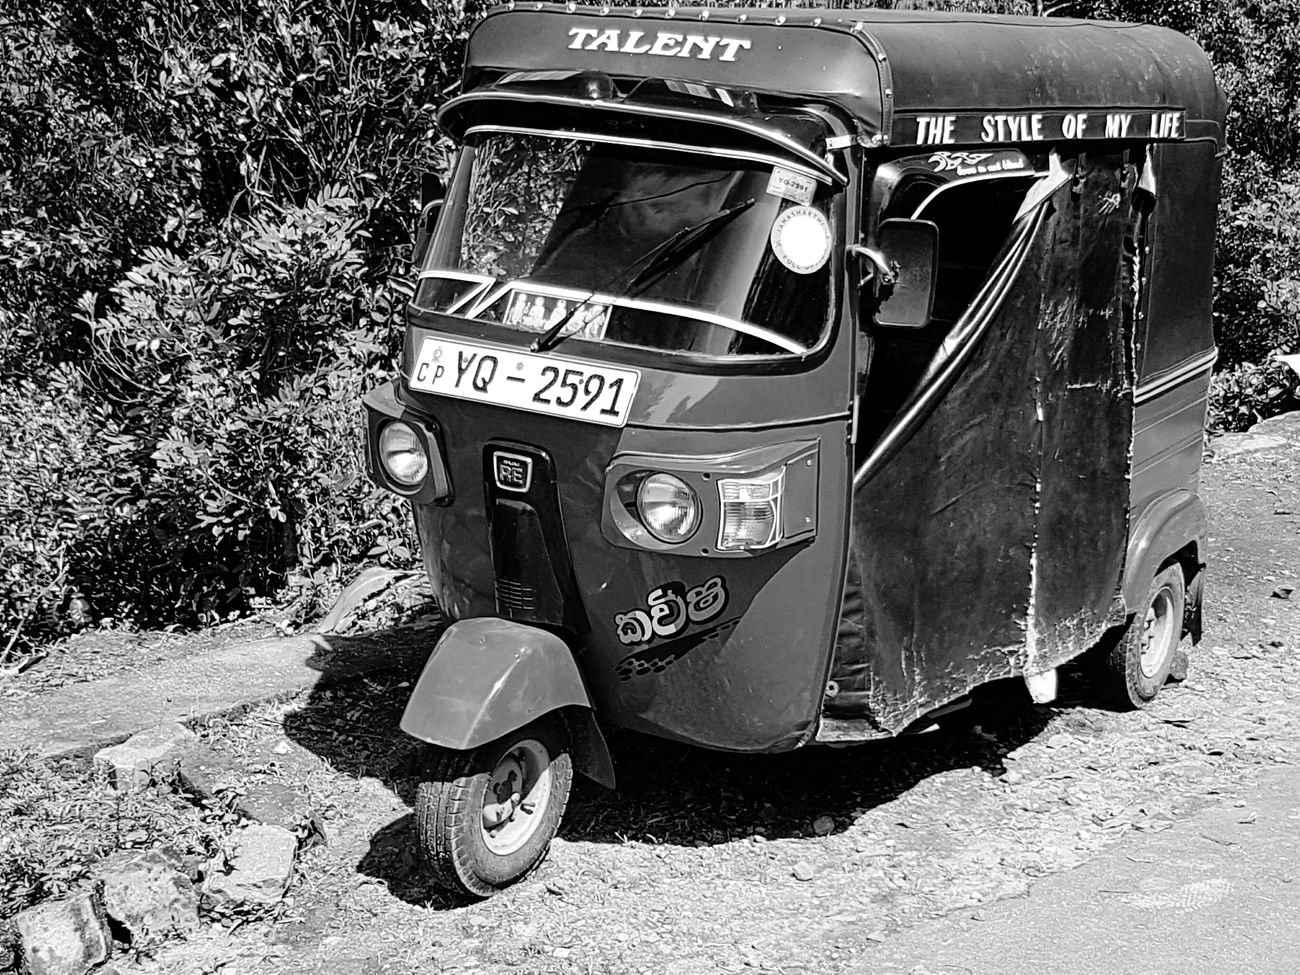 Holiday2017 Samsung Galaxy S7 Holiday Black & White Sri Lanka Glenloch Tea Plantation  Tuctuc Red Vehicle 3 Wheels